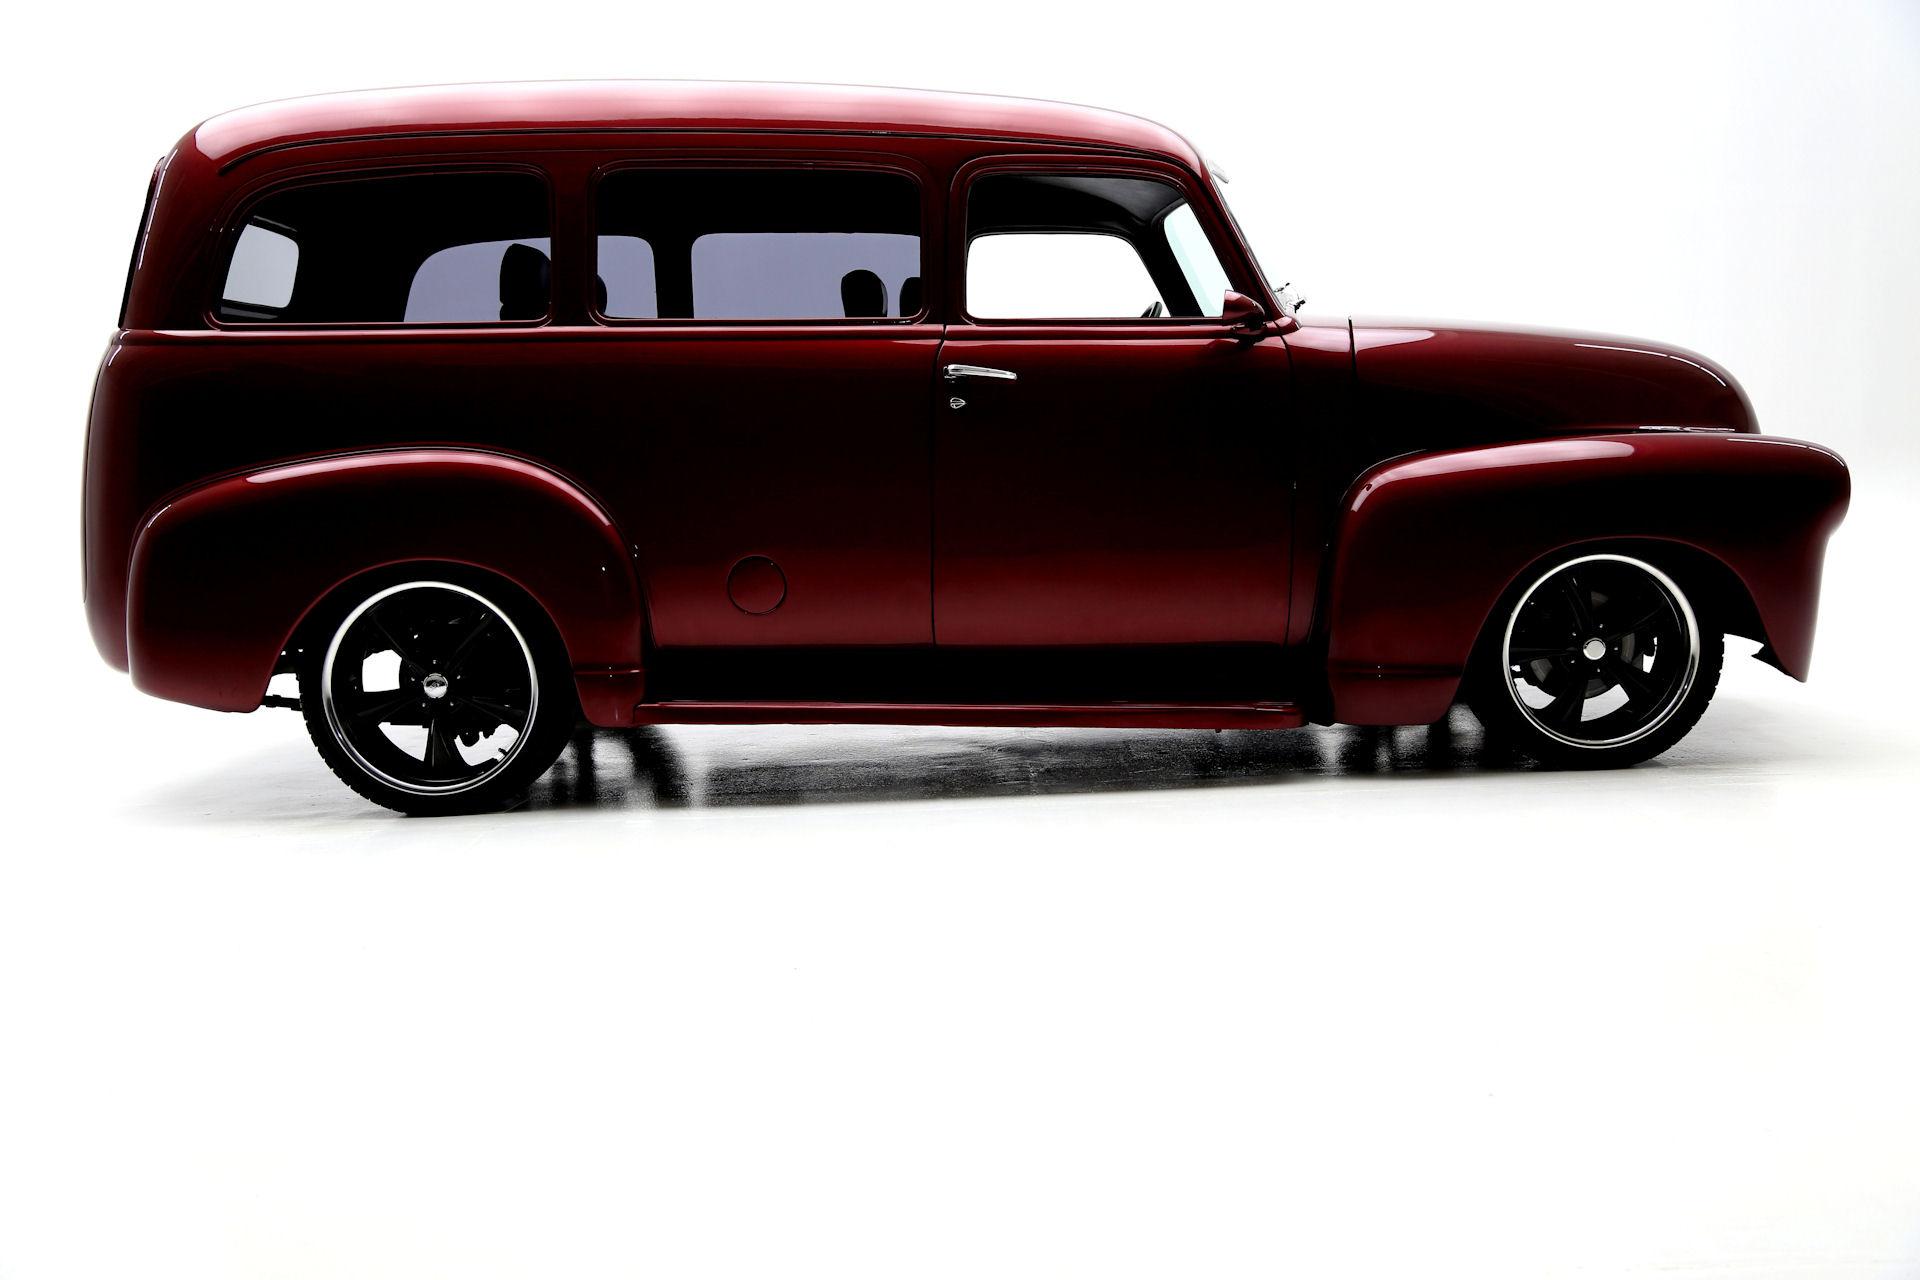 1951 Chevrolet Suburban Burgundy,Black Leather, RestoMod - American ...